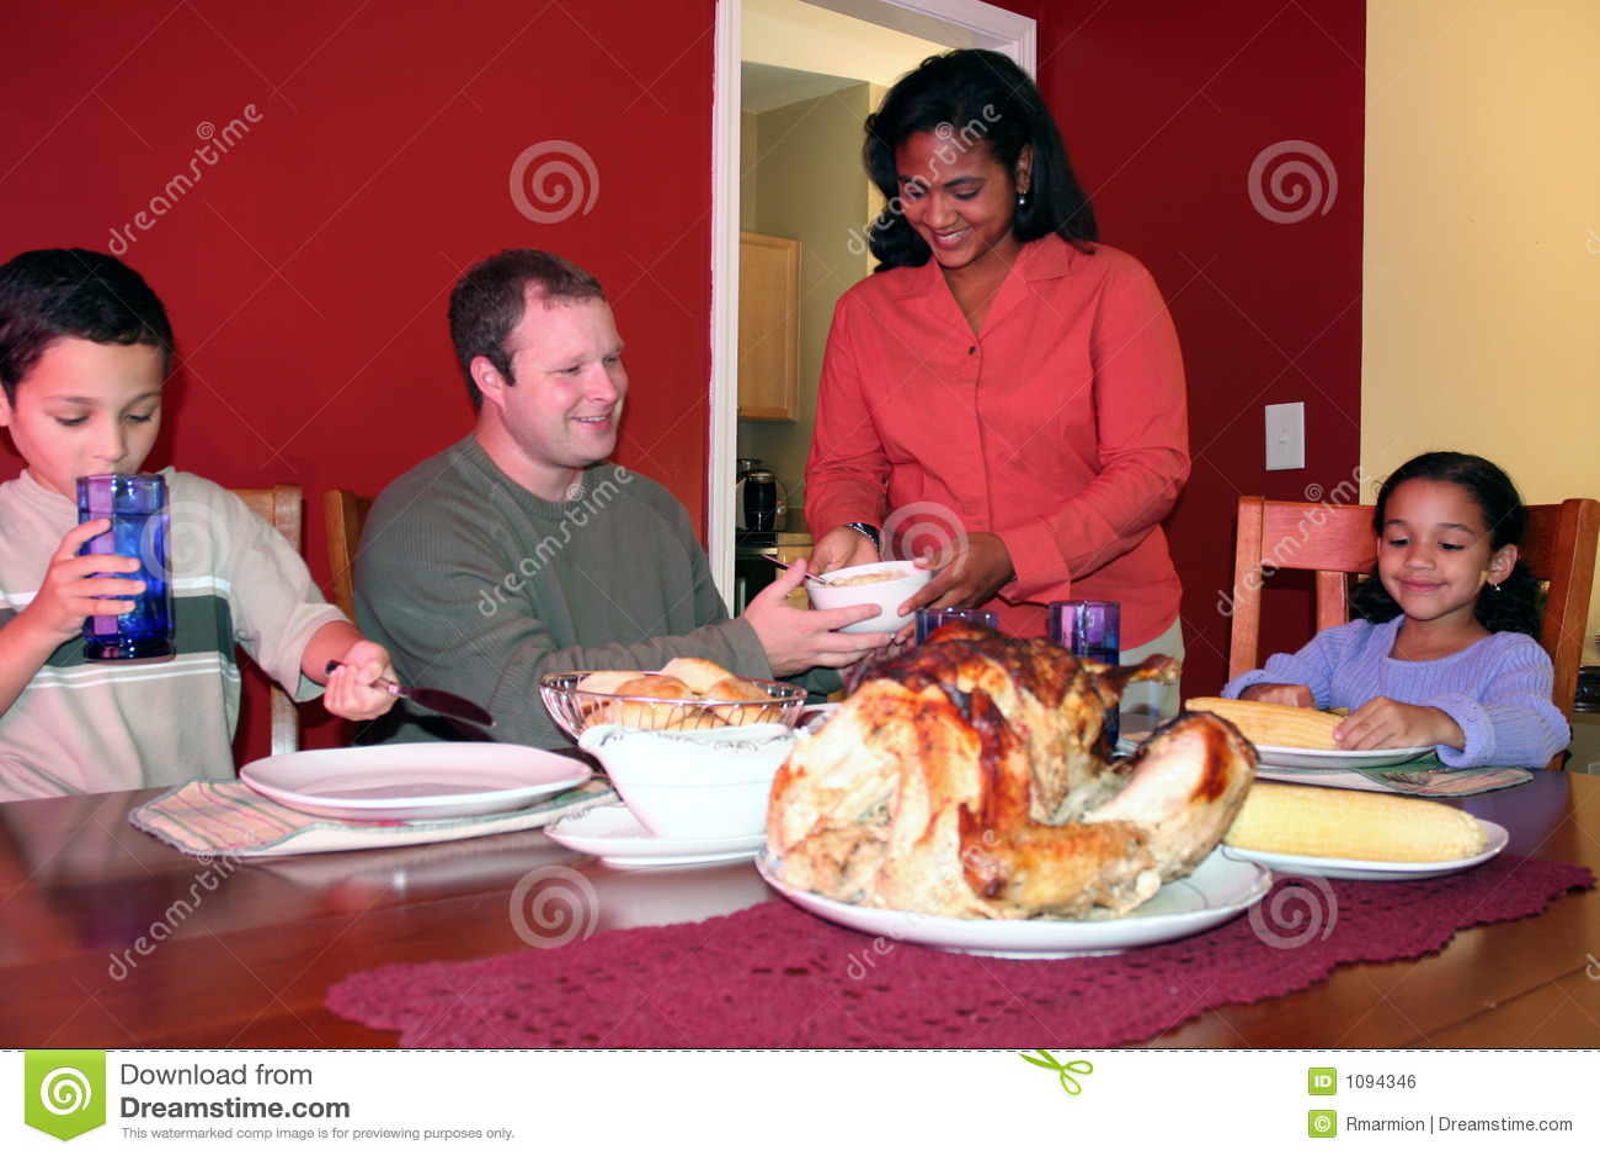 Thanksgiving Family Dinner Royalty Free Stock Image ...